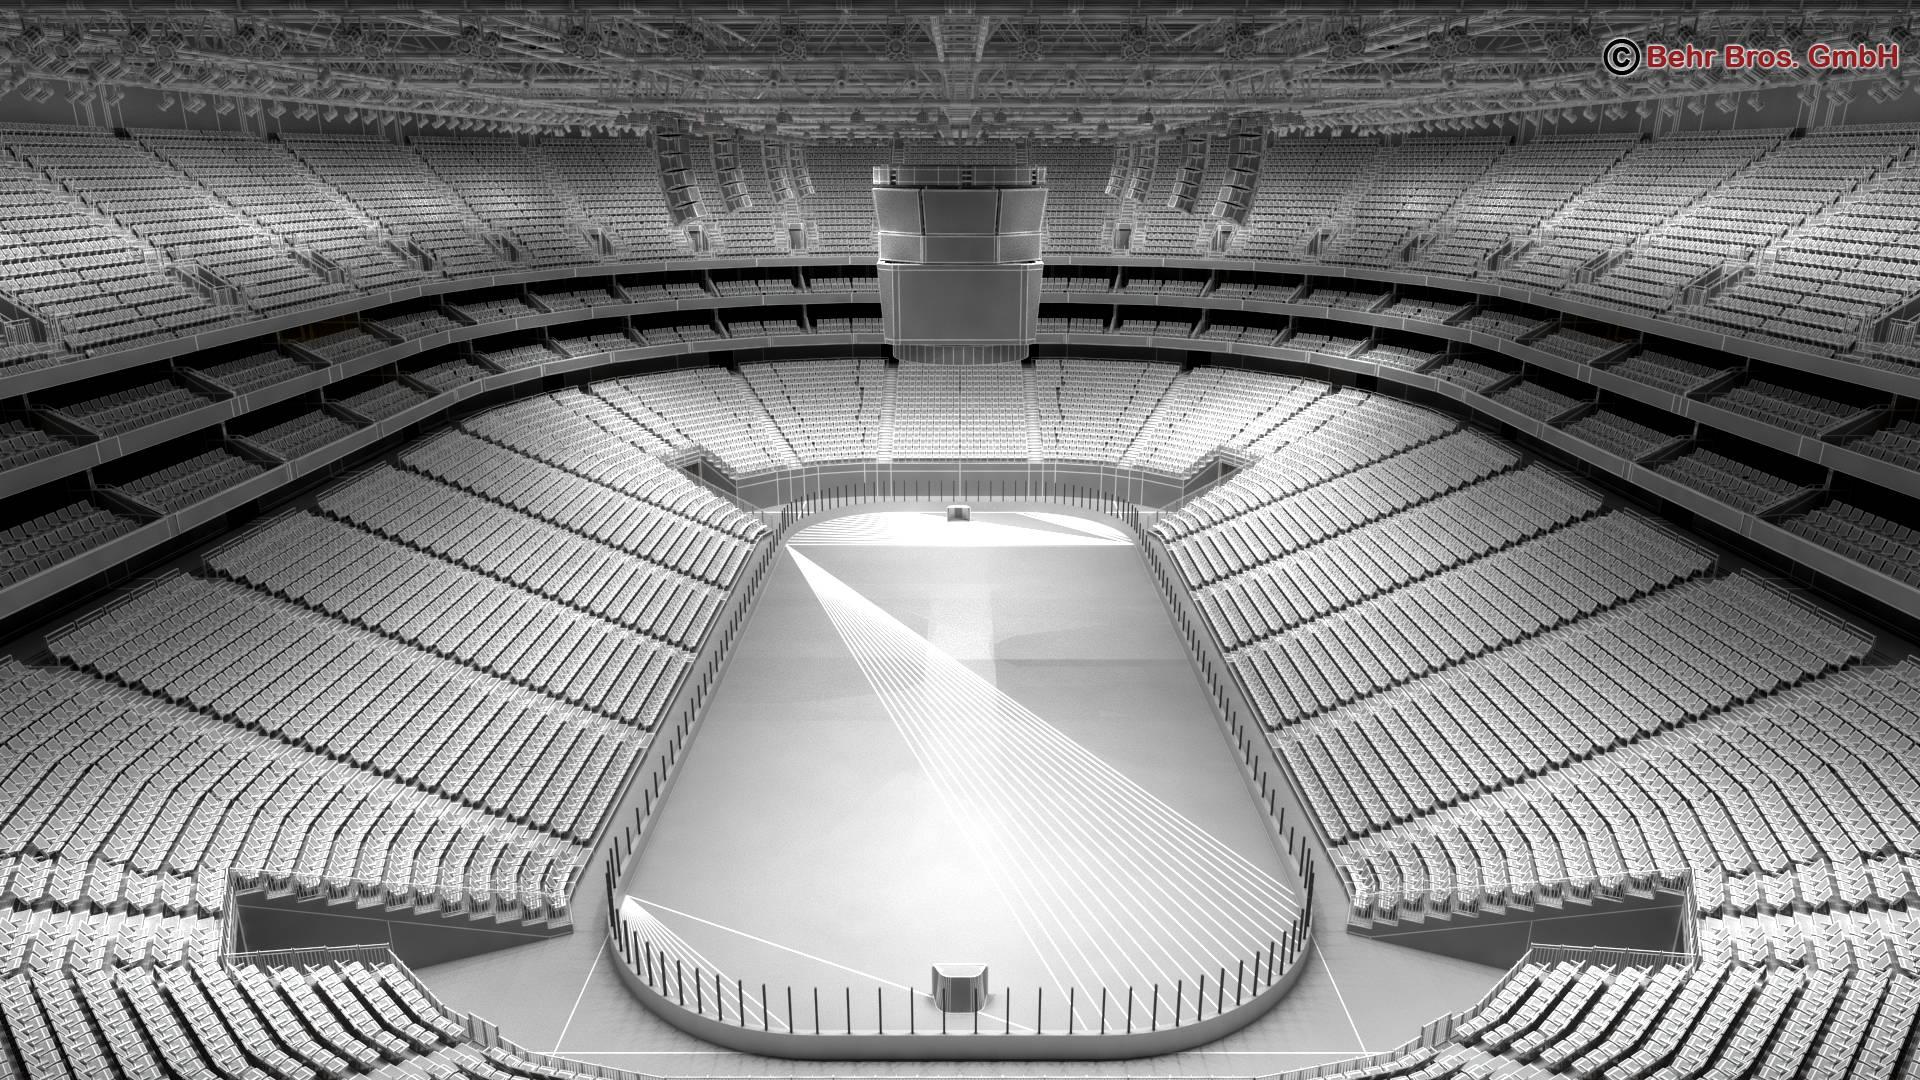 мөсөн хоккейн талбай V2 3d загвар 3ds max fbx c4d 251660